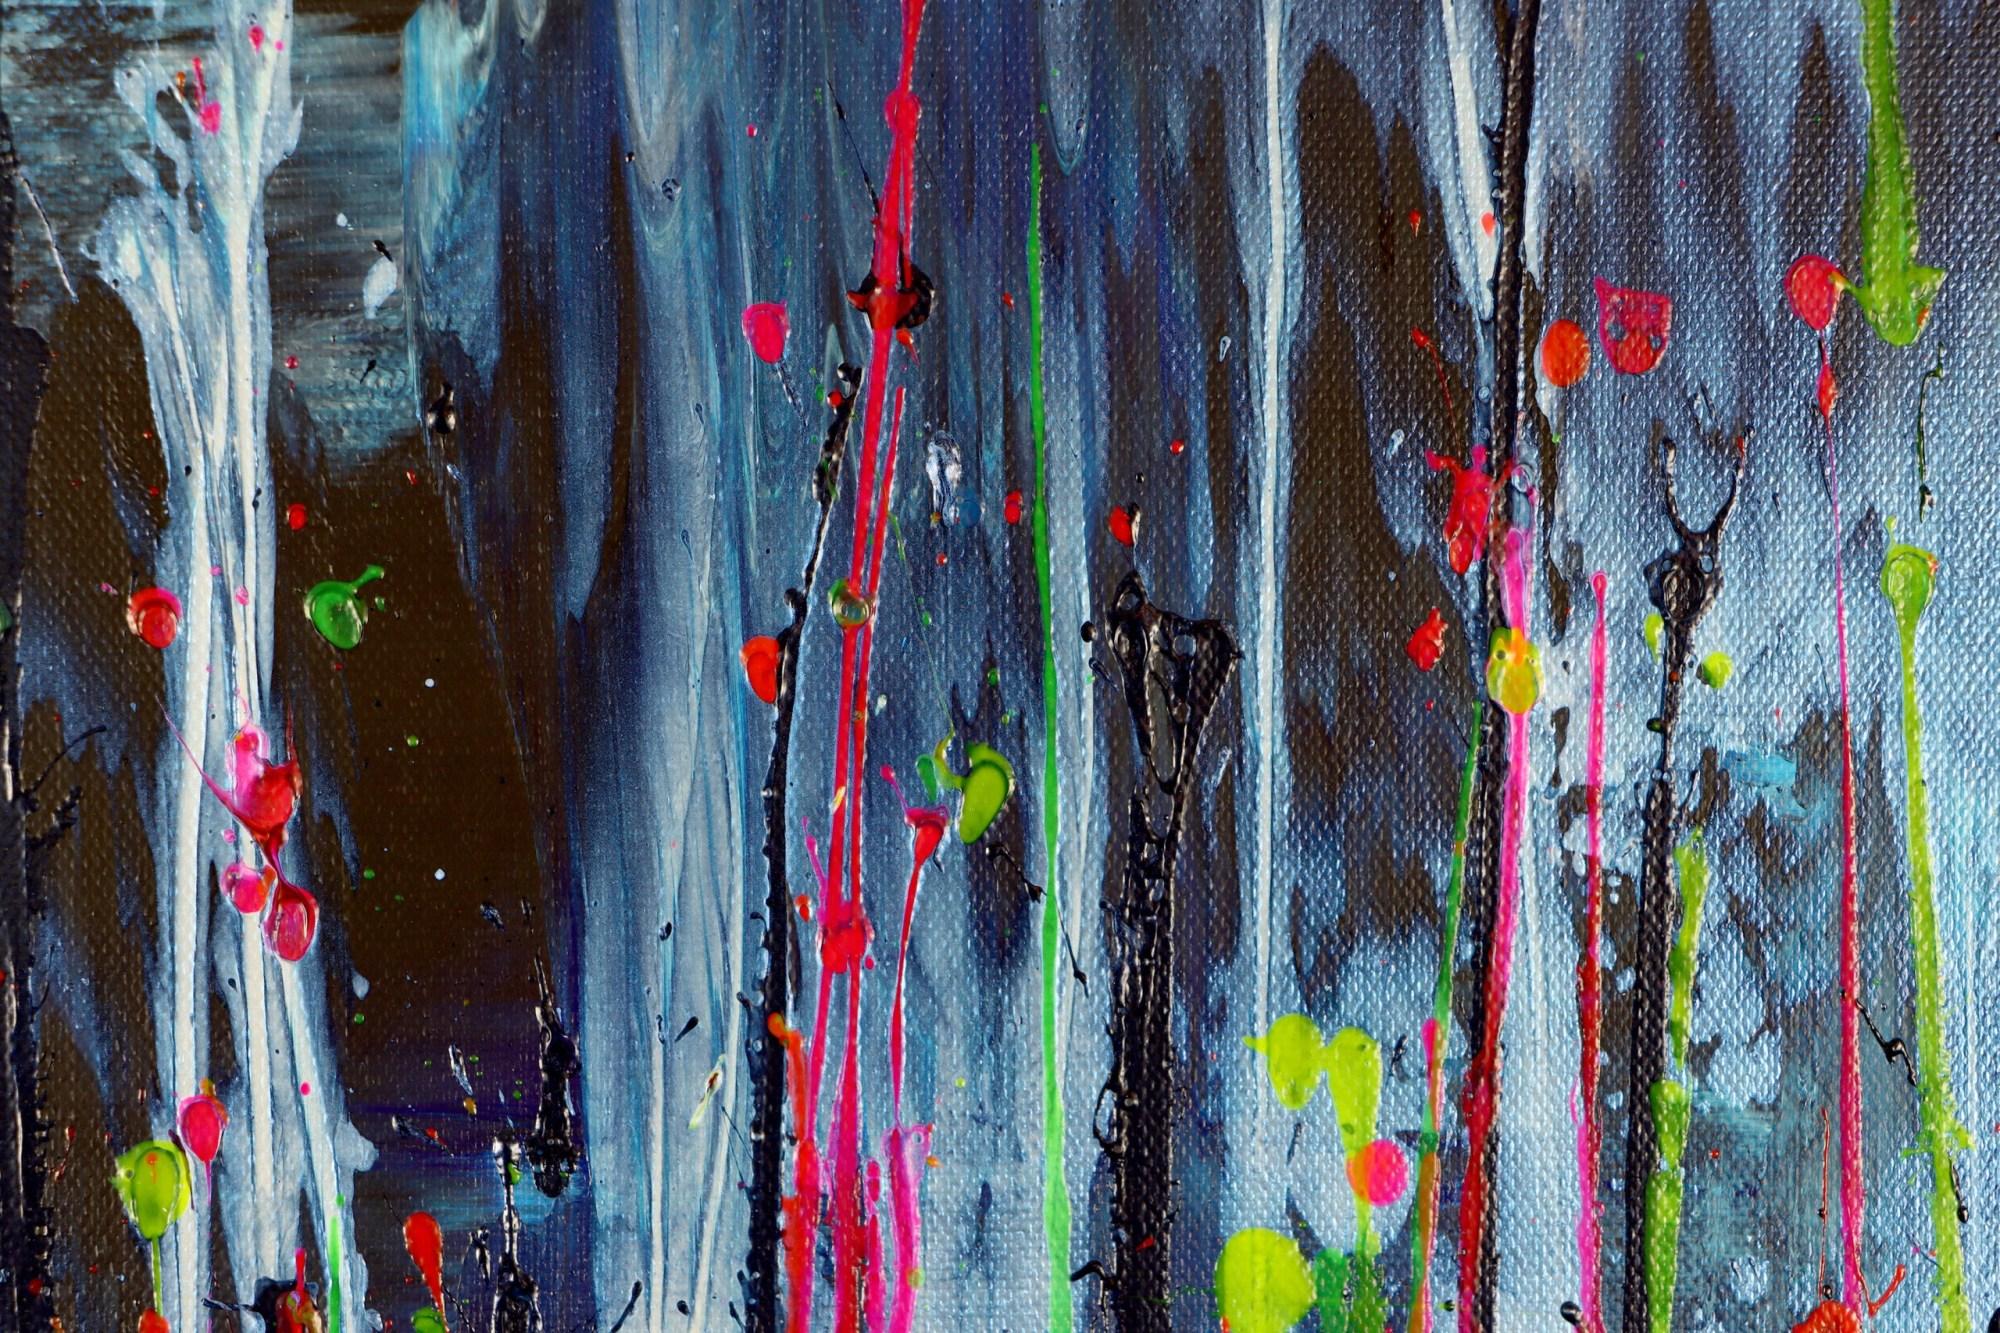 High Frequency Garden 1 (2021) / Artist: Nestor Toro